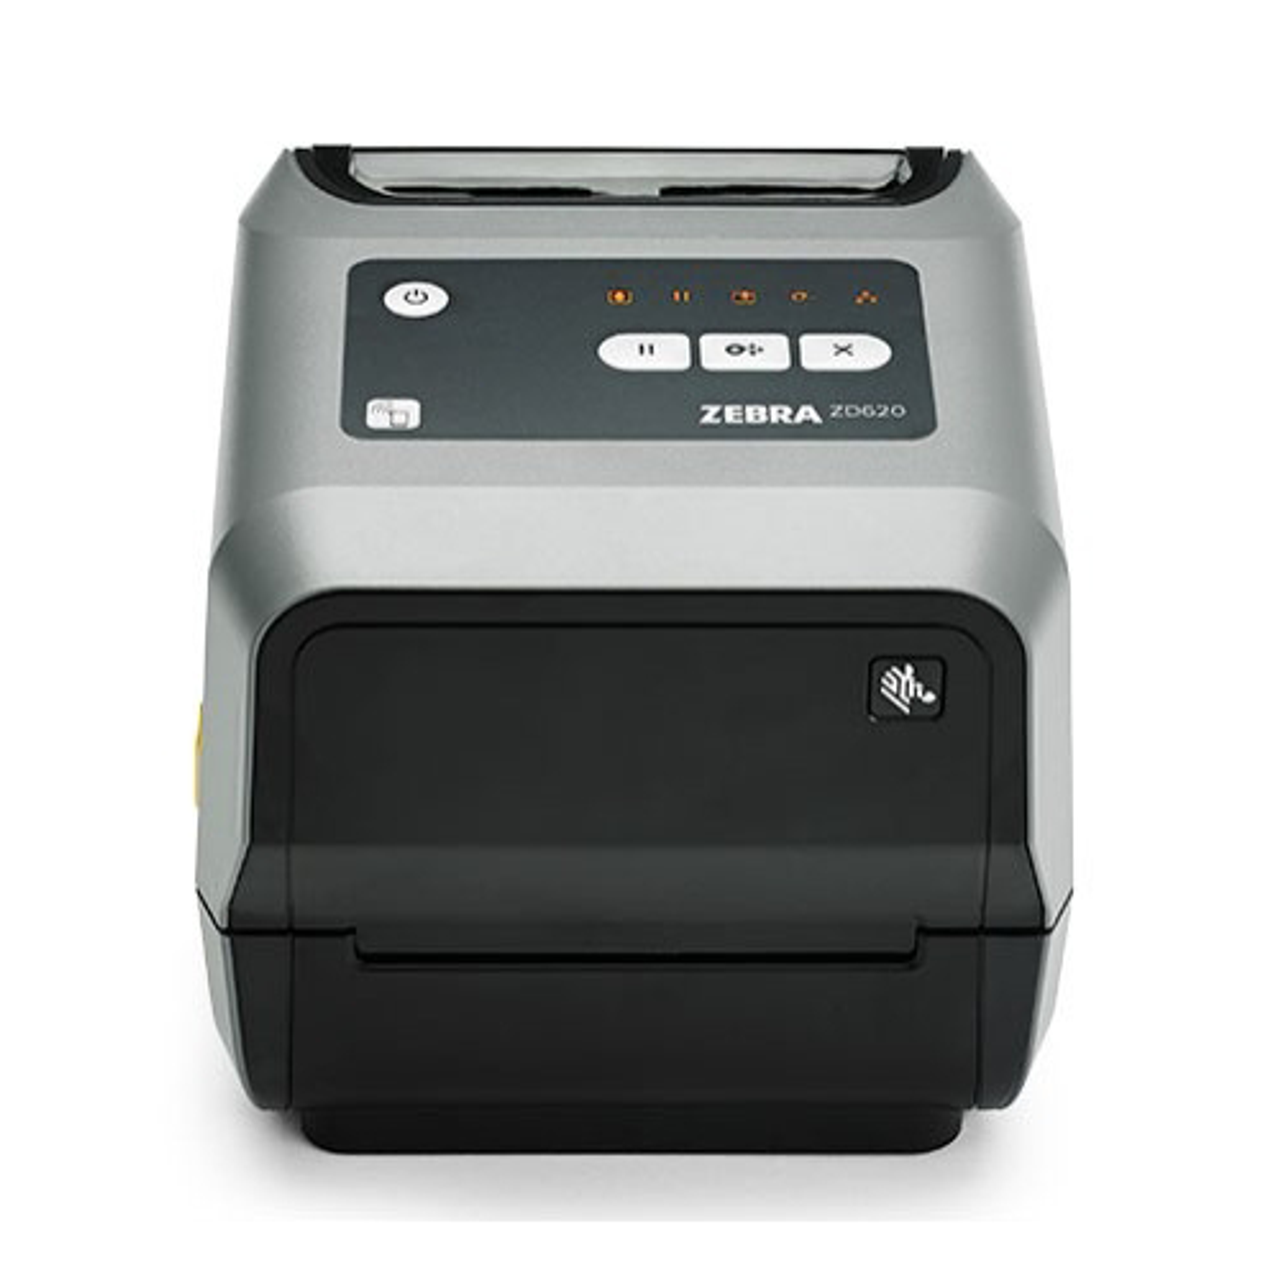 Zebra ZD620 Direct Thermal Label Printer - Barcodes com au